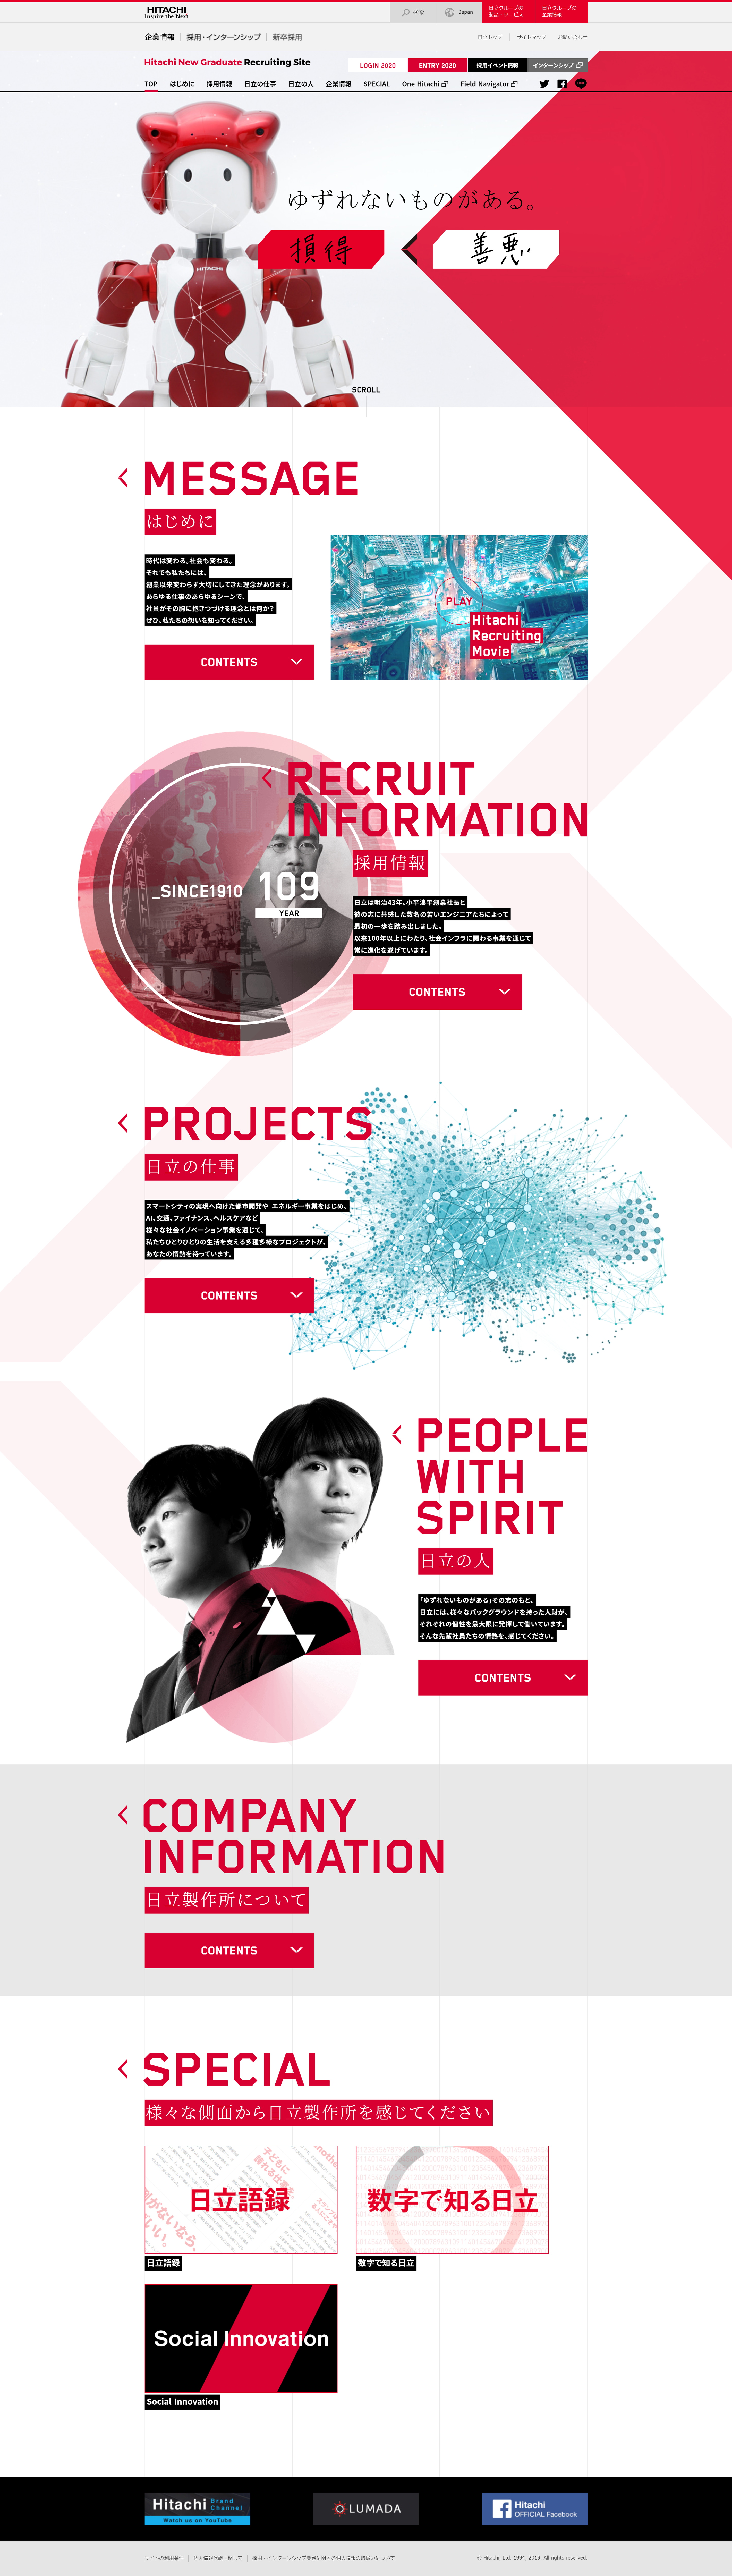 Recruitment Agency Website Ideas Recruitmentagencywebsite In 2020 Recruitment Website Design Web Design Agency Web Design